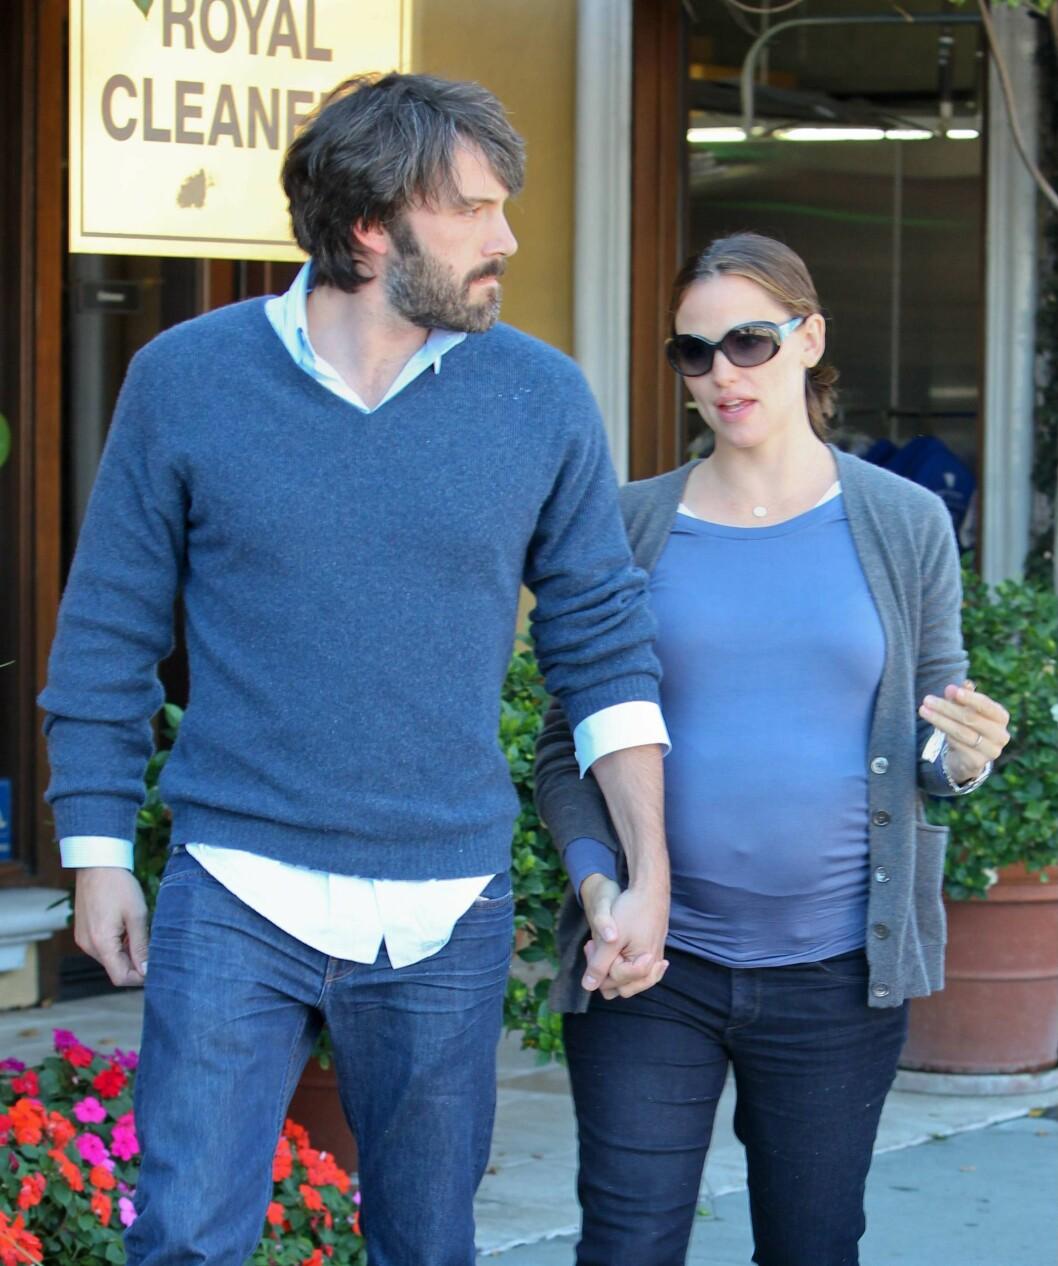 <strong>HØSTEN 2011:</strong> Jennifer Garner, som var gravid med sønnen Samuel, hånd i hånd med Ben Affleck i Santa Monica.  Foto: SipaUSA